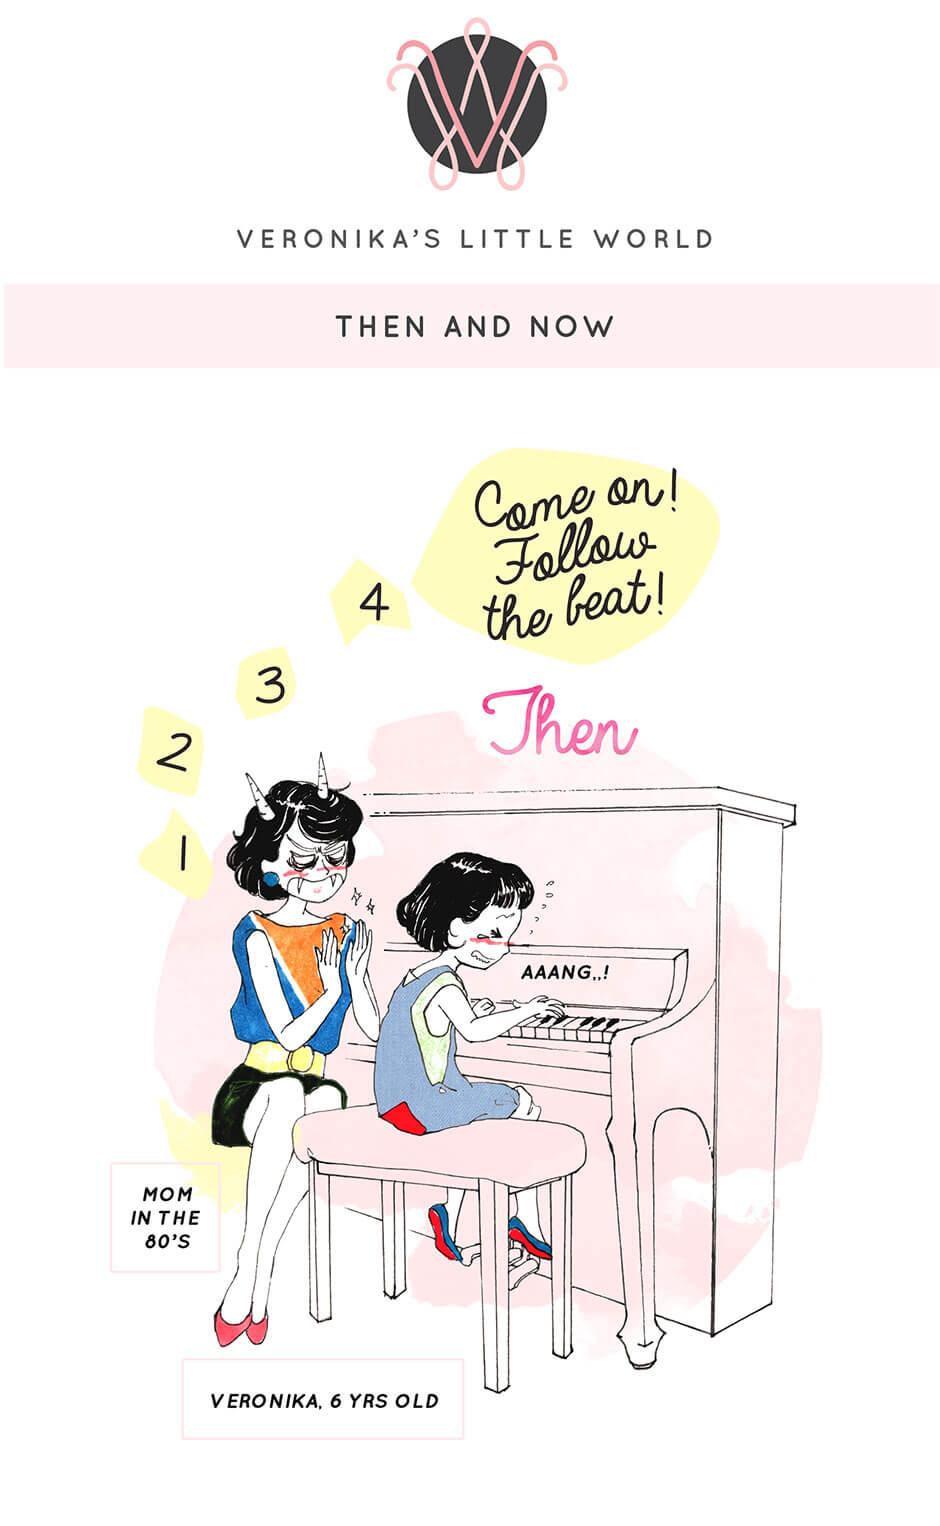 Tickled Pink Confetti | Veronika's Little World | Then & Now | Parenting (Mis)Adventures | Webcomic | Part 01